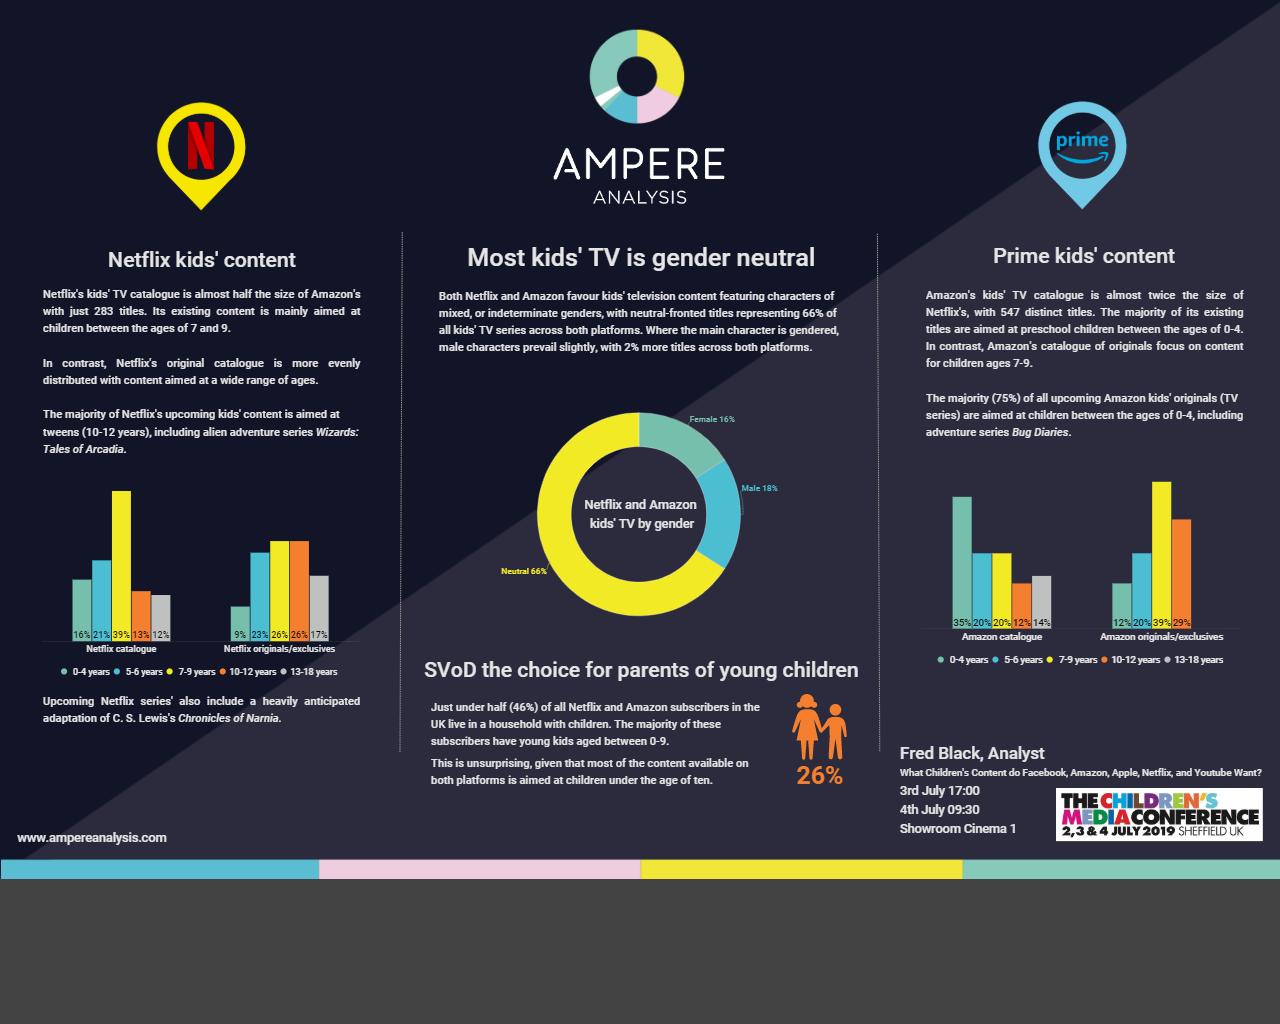 ampere_svod_infographic